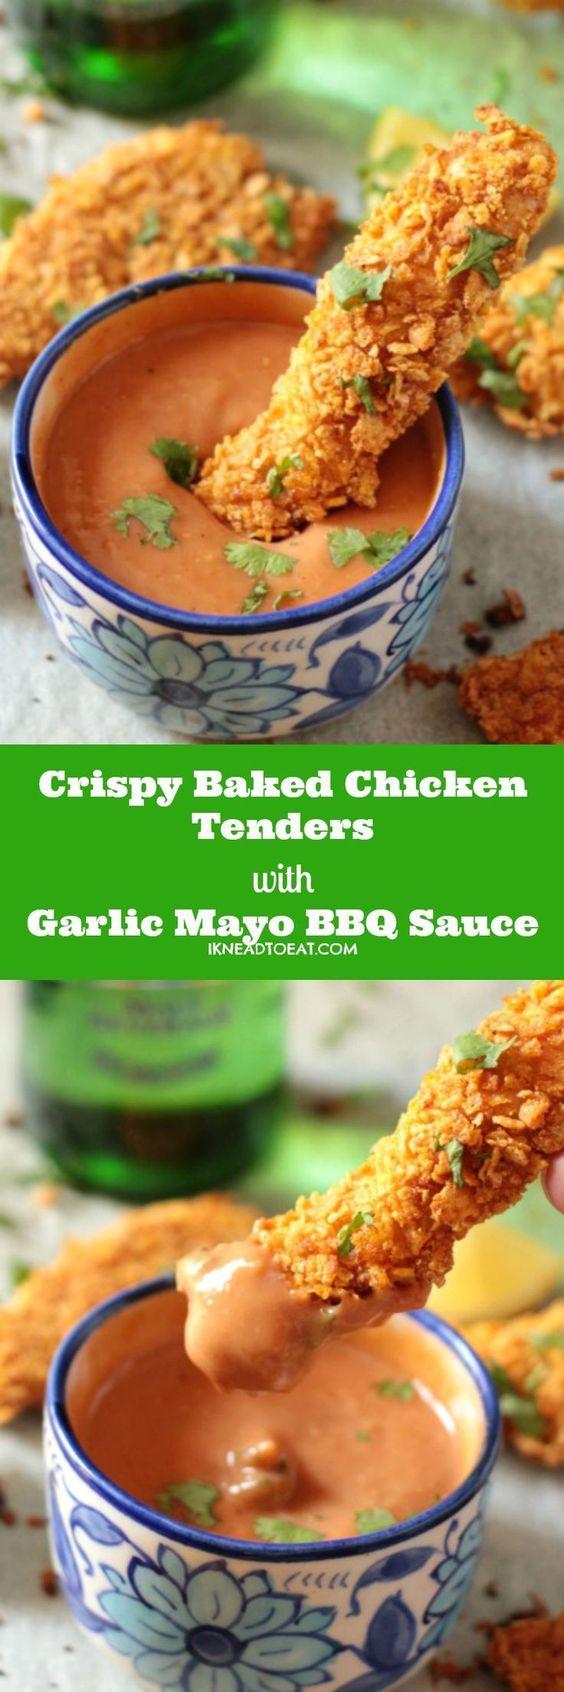 Crispy Baked Chicken Tenders with Garlic Mayo BBQ Sauce : ikneadtoeat                                                                                                                                                      More